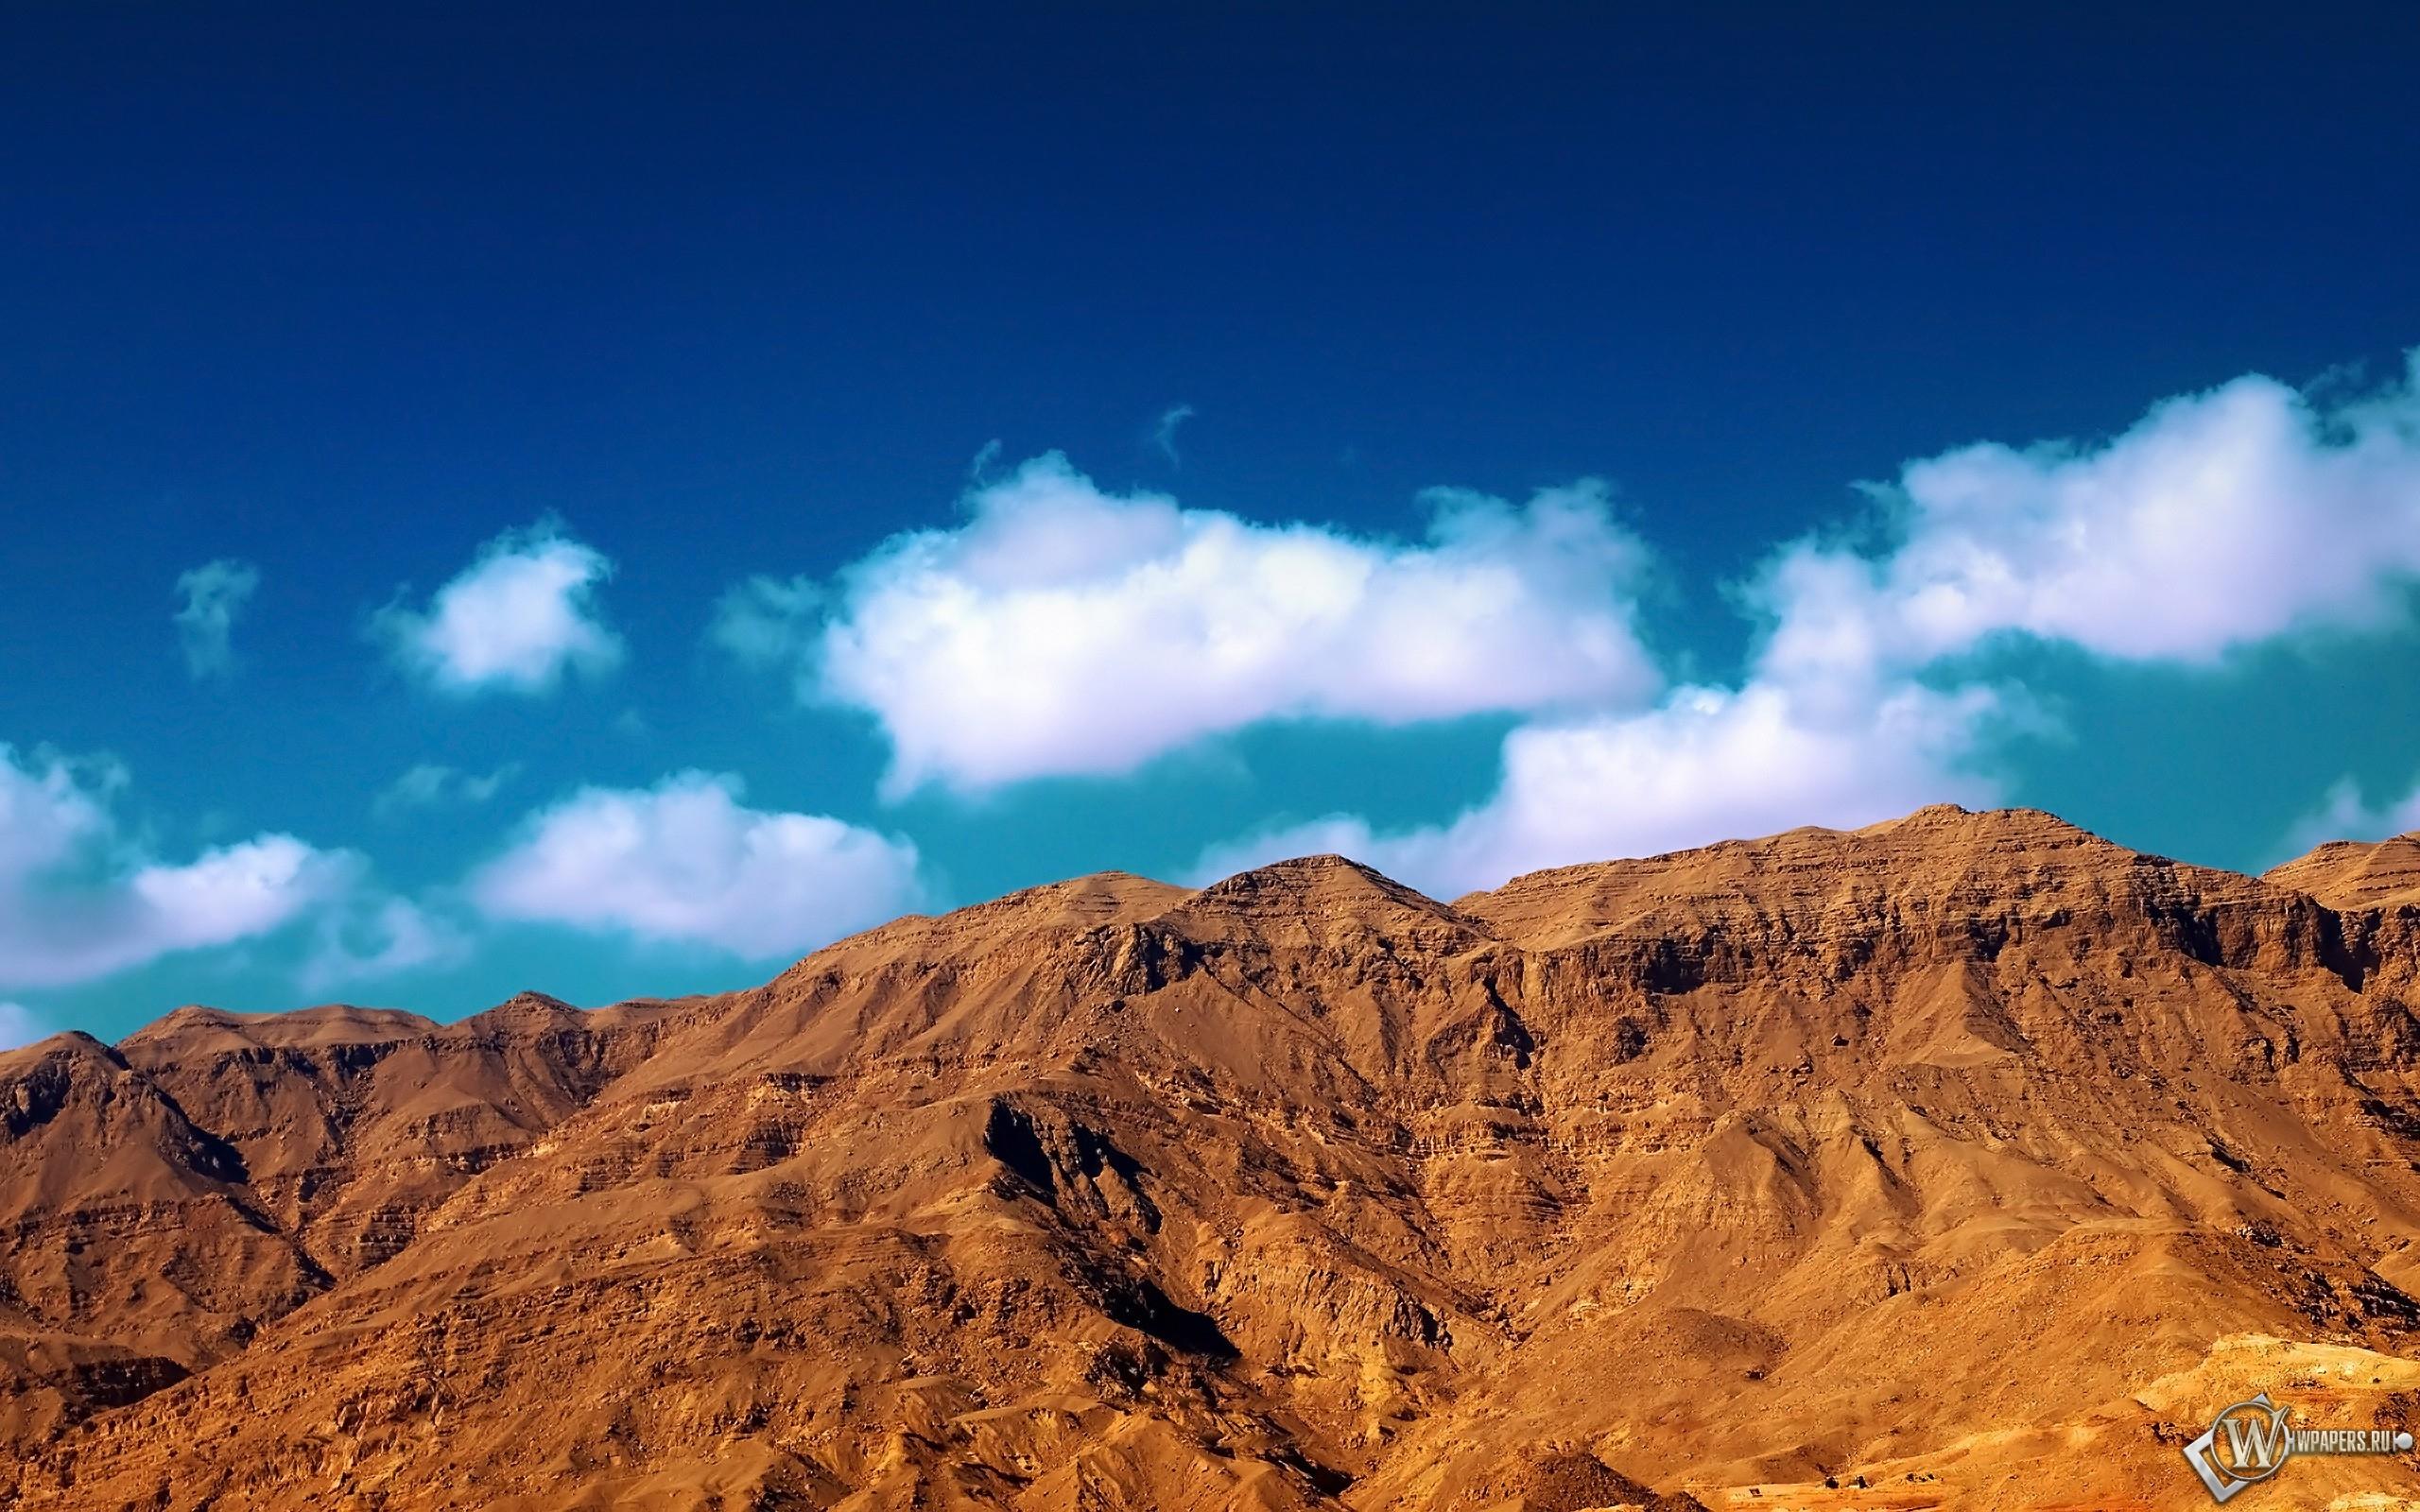 Ataqa mountain 2560x1600